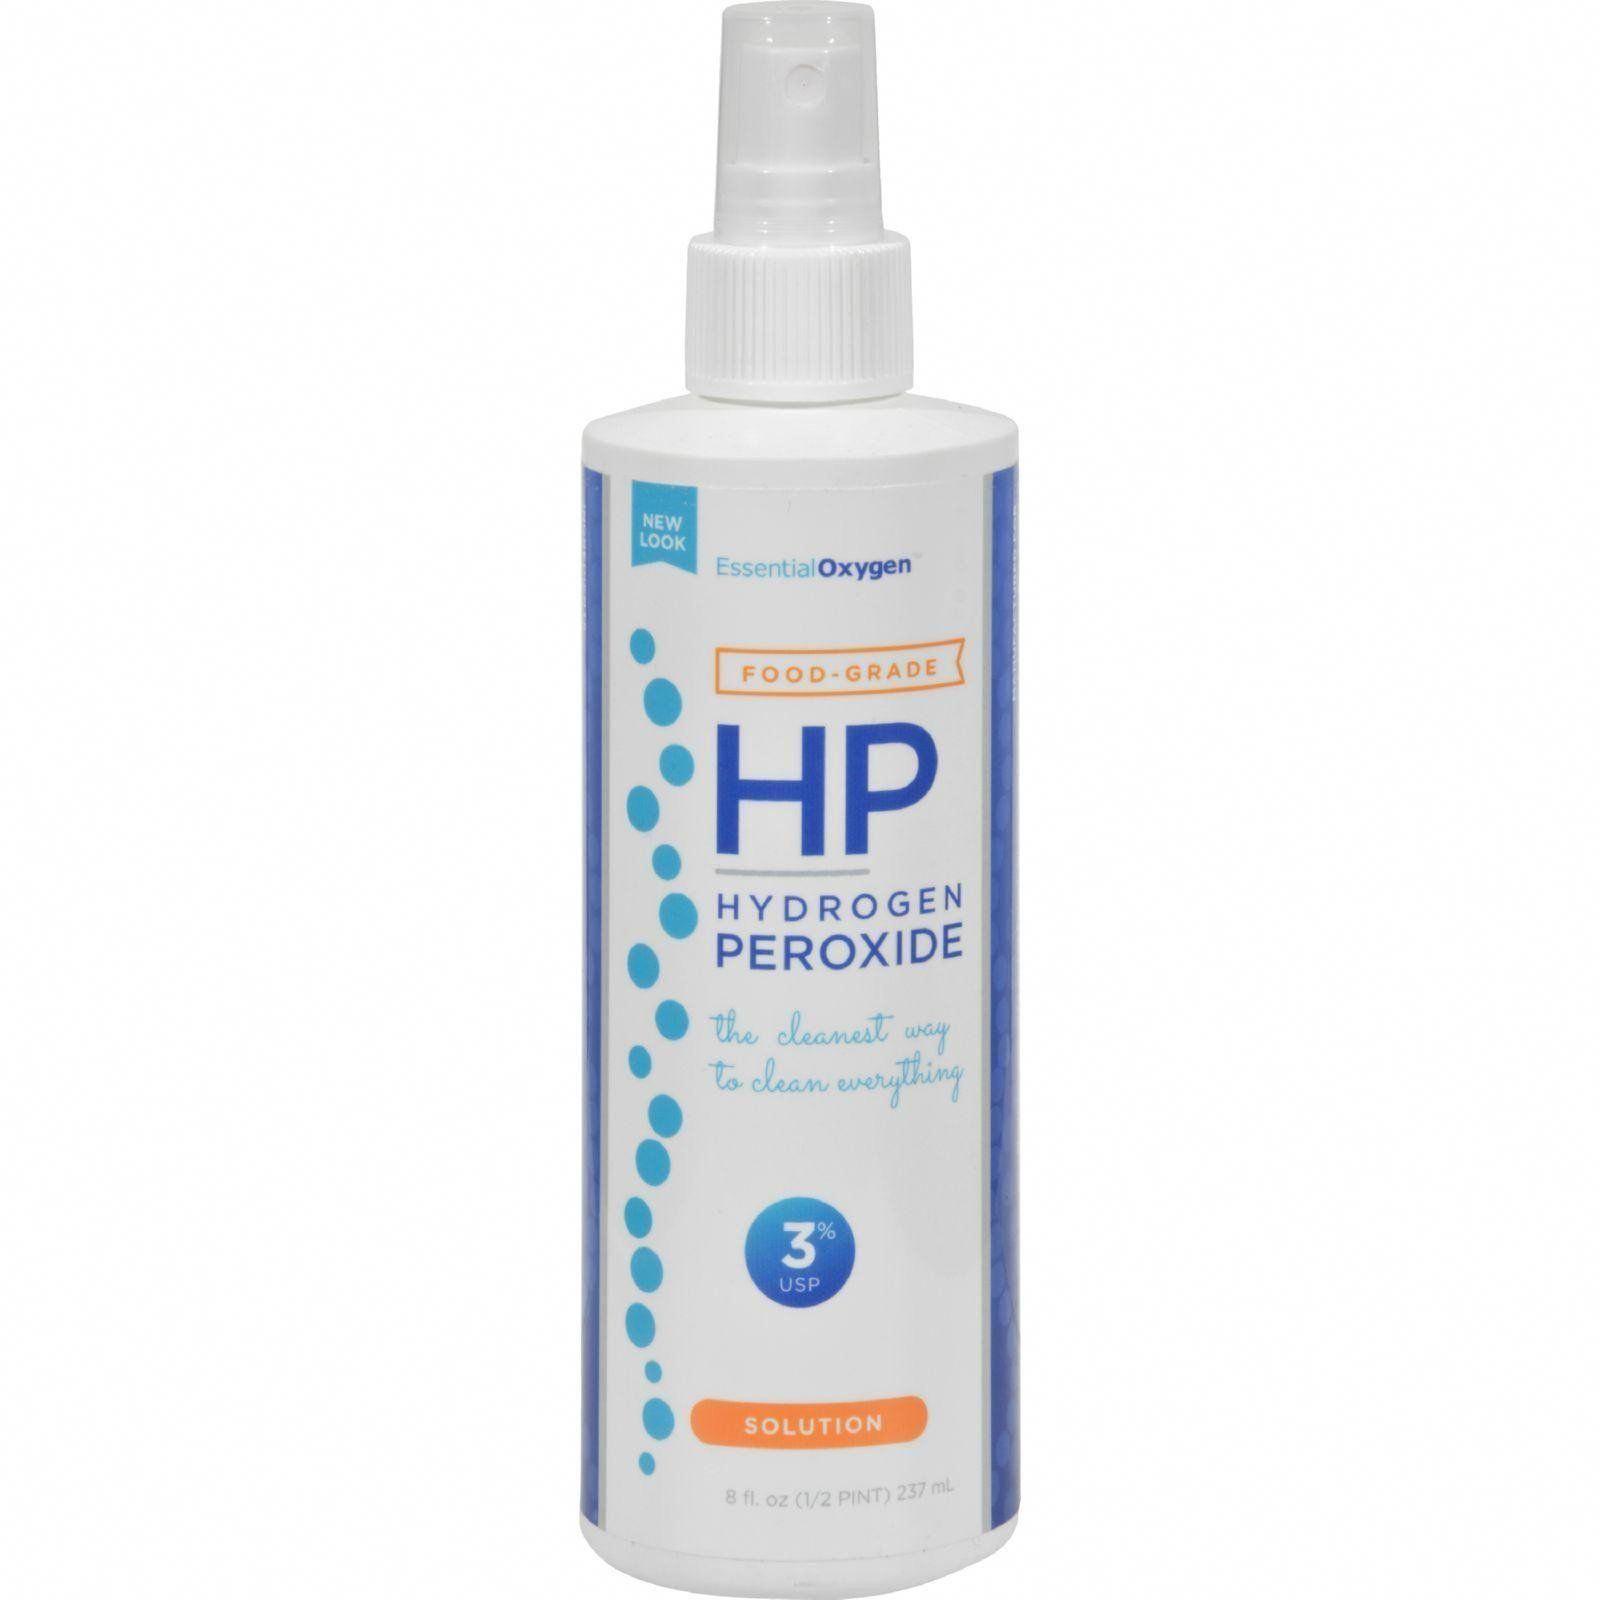 Absorbed Hydrogenated Oil White Vinegar Oilchange Doablehydrogenatedoilstainremovers Food Grade Hydrogen Peroxide Hydrogen Peroxide Anti Bacterial Mouthwash